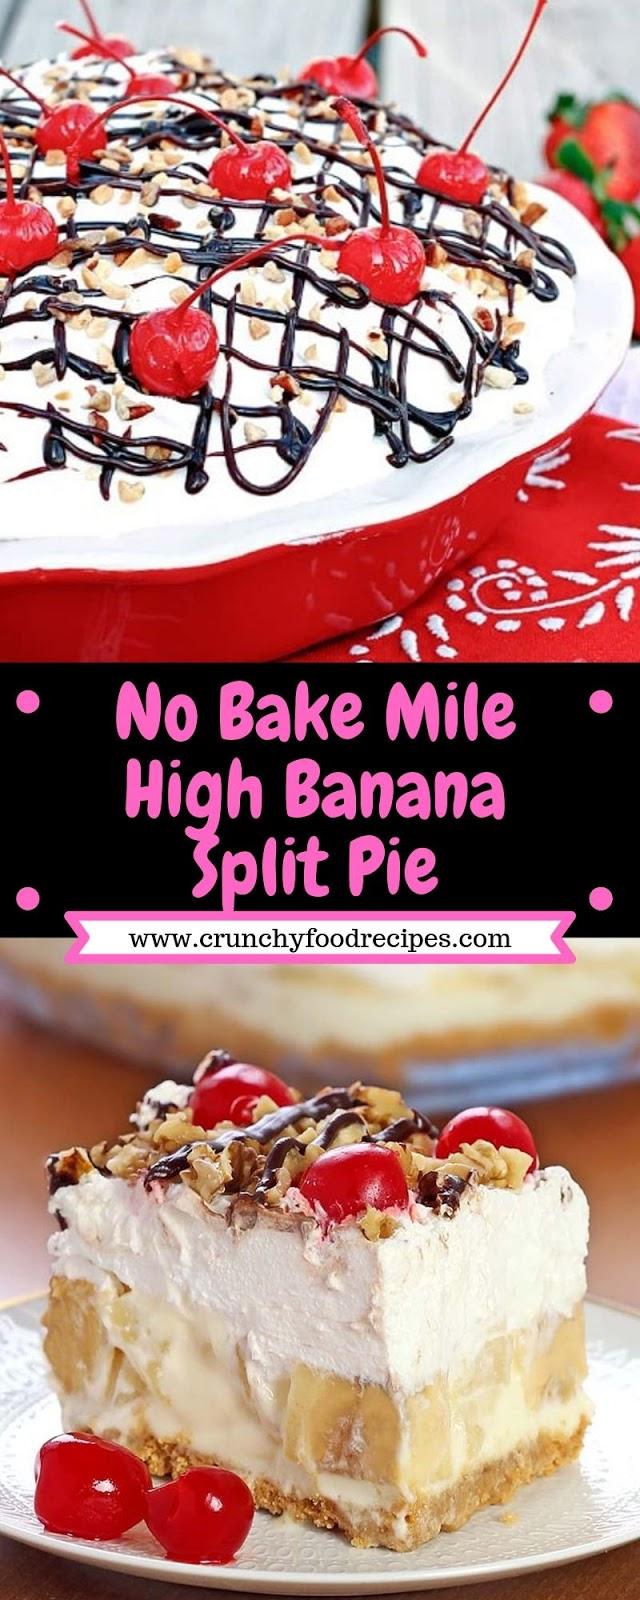 No Bake Mile High Banana Split Pie